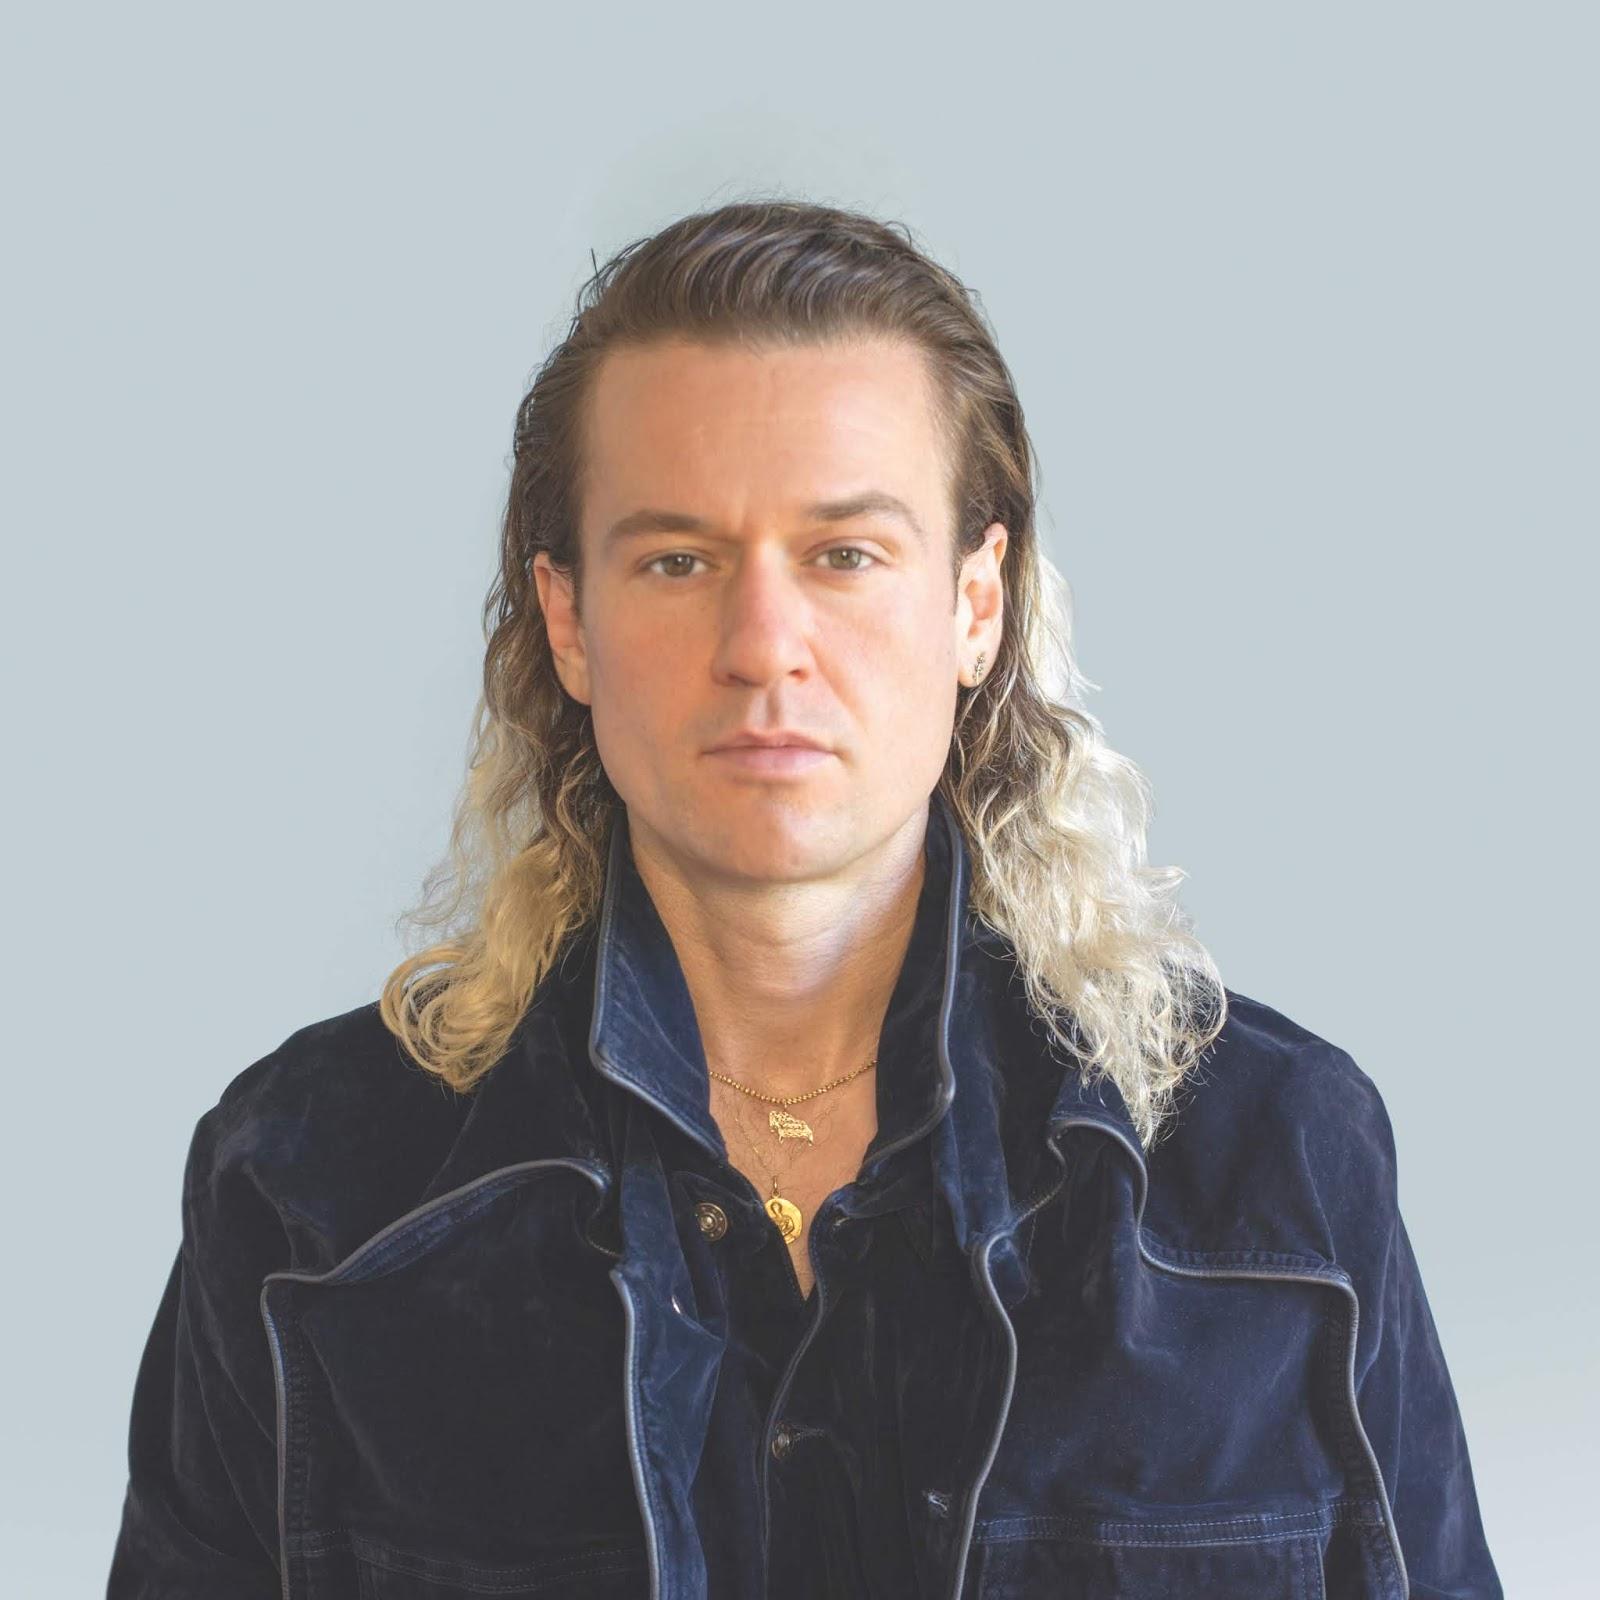 John Carroll Kirby ist jetzt bei Stones Throw Records | Erstes Soloalbum 'My Garden'